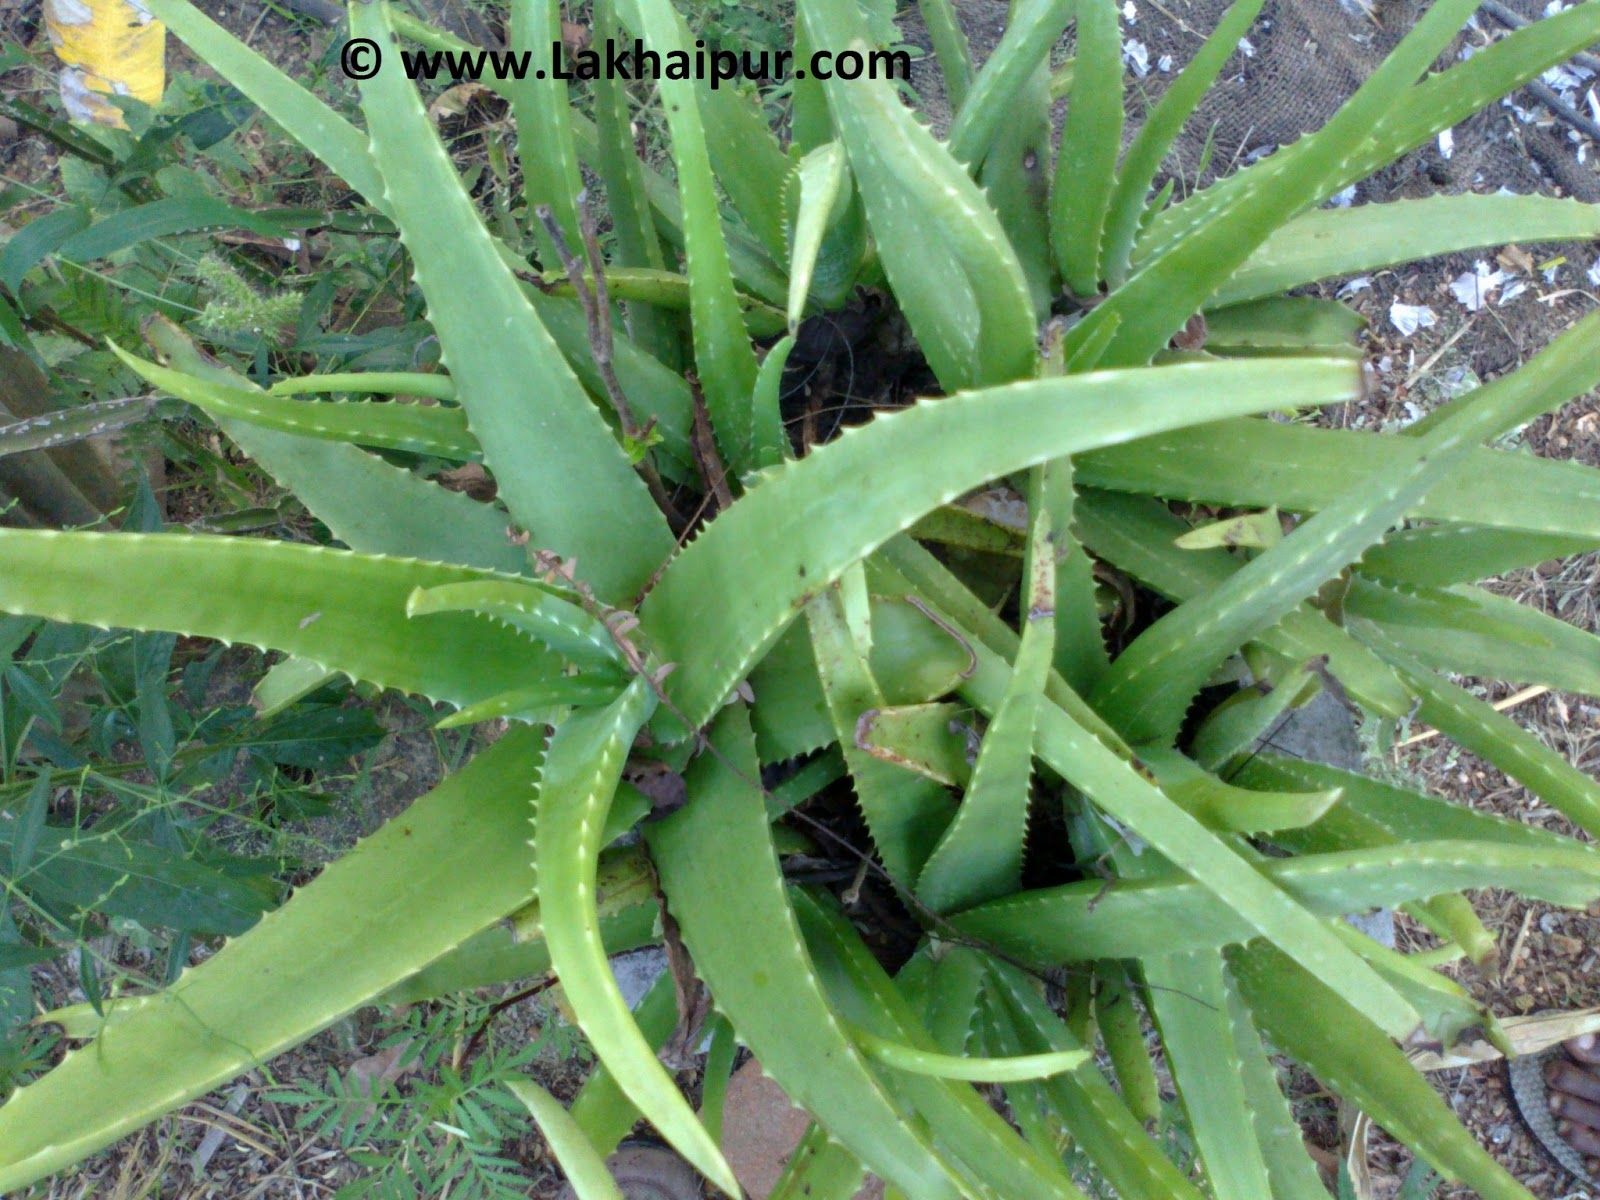 Domestic use of aloe vera all about ayurved herbs herbal medicine herbal treatment - Aloe vera plante utilisation ...